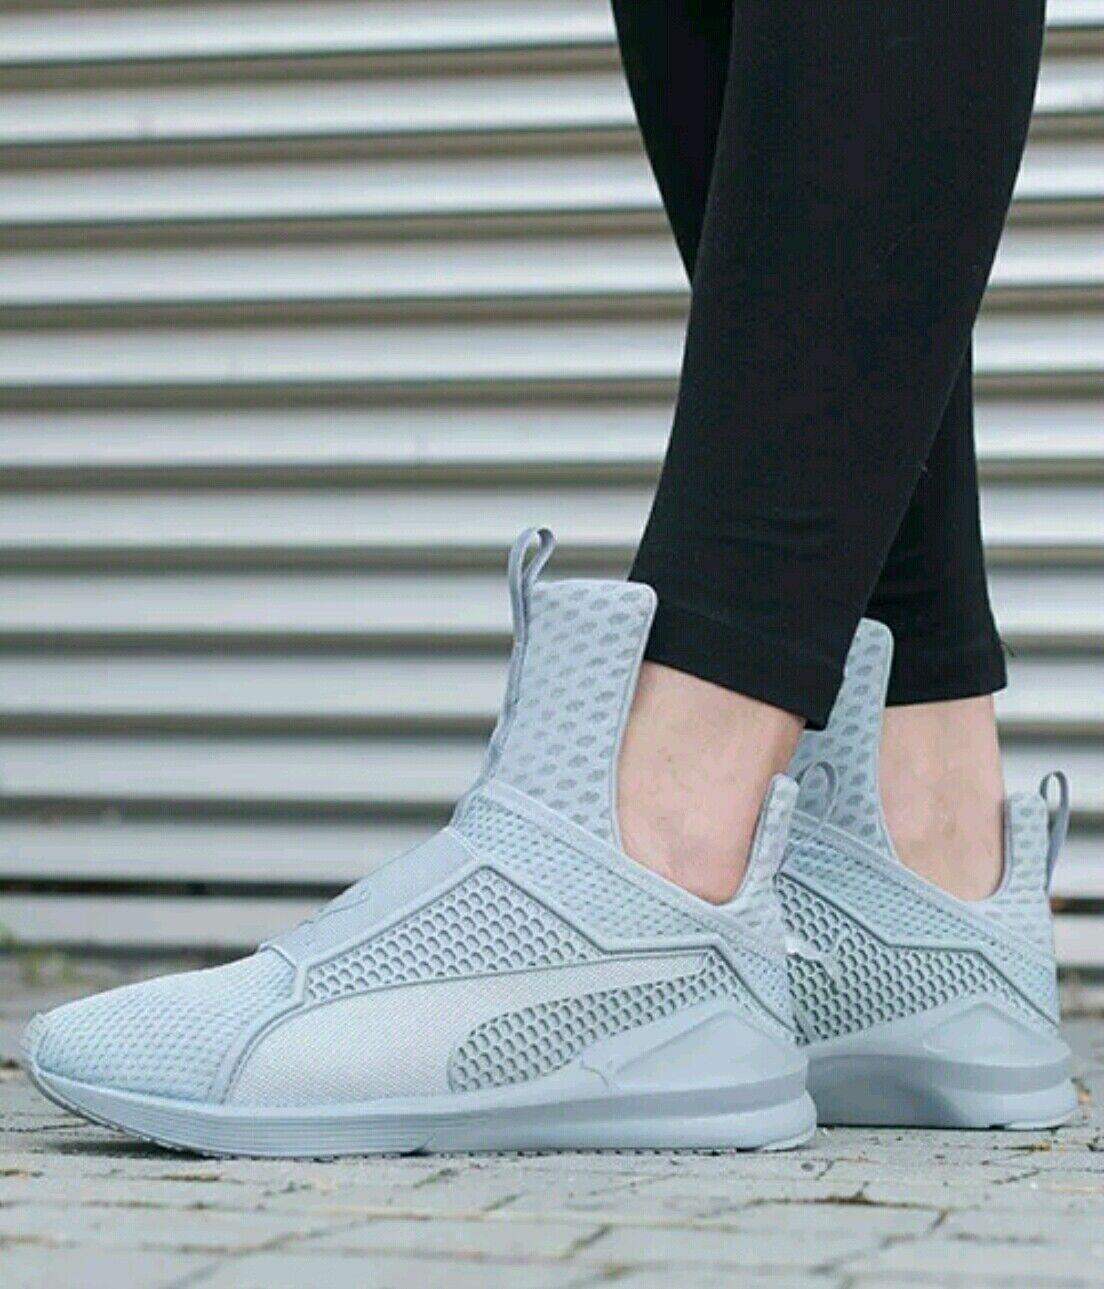 PUMA by Shoes Rihanna 'Fenty' Grey Trainer Sneakers Shoes by (Women) sz 7 4cf9c6